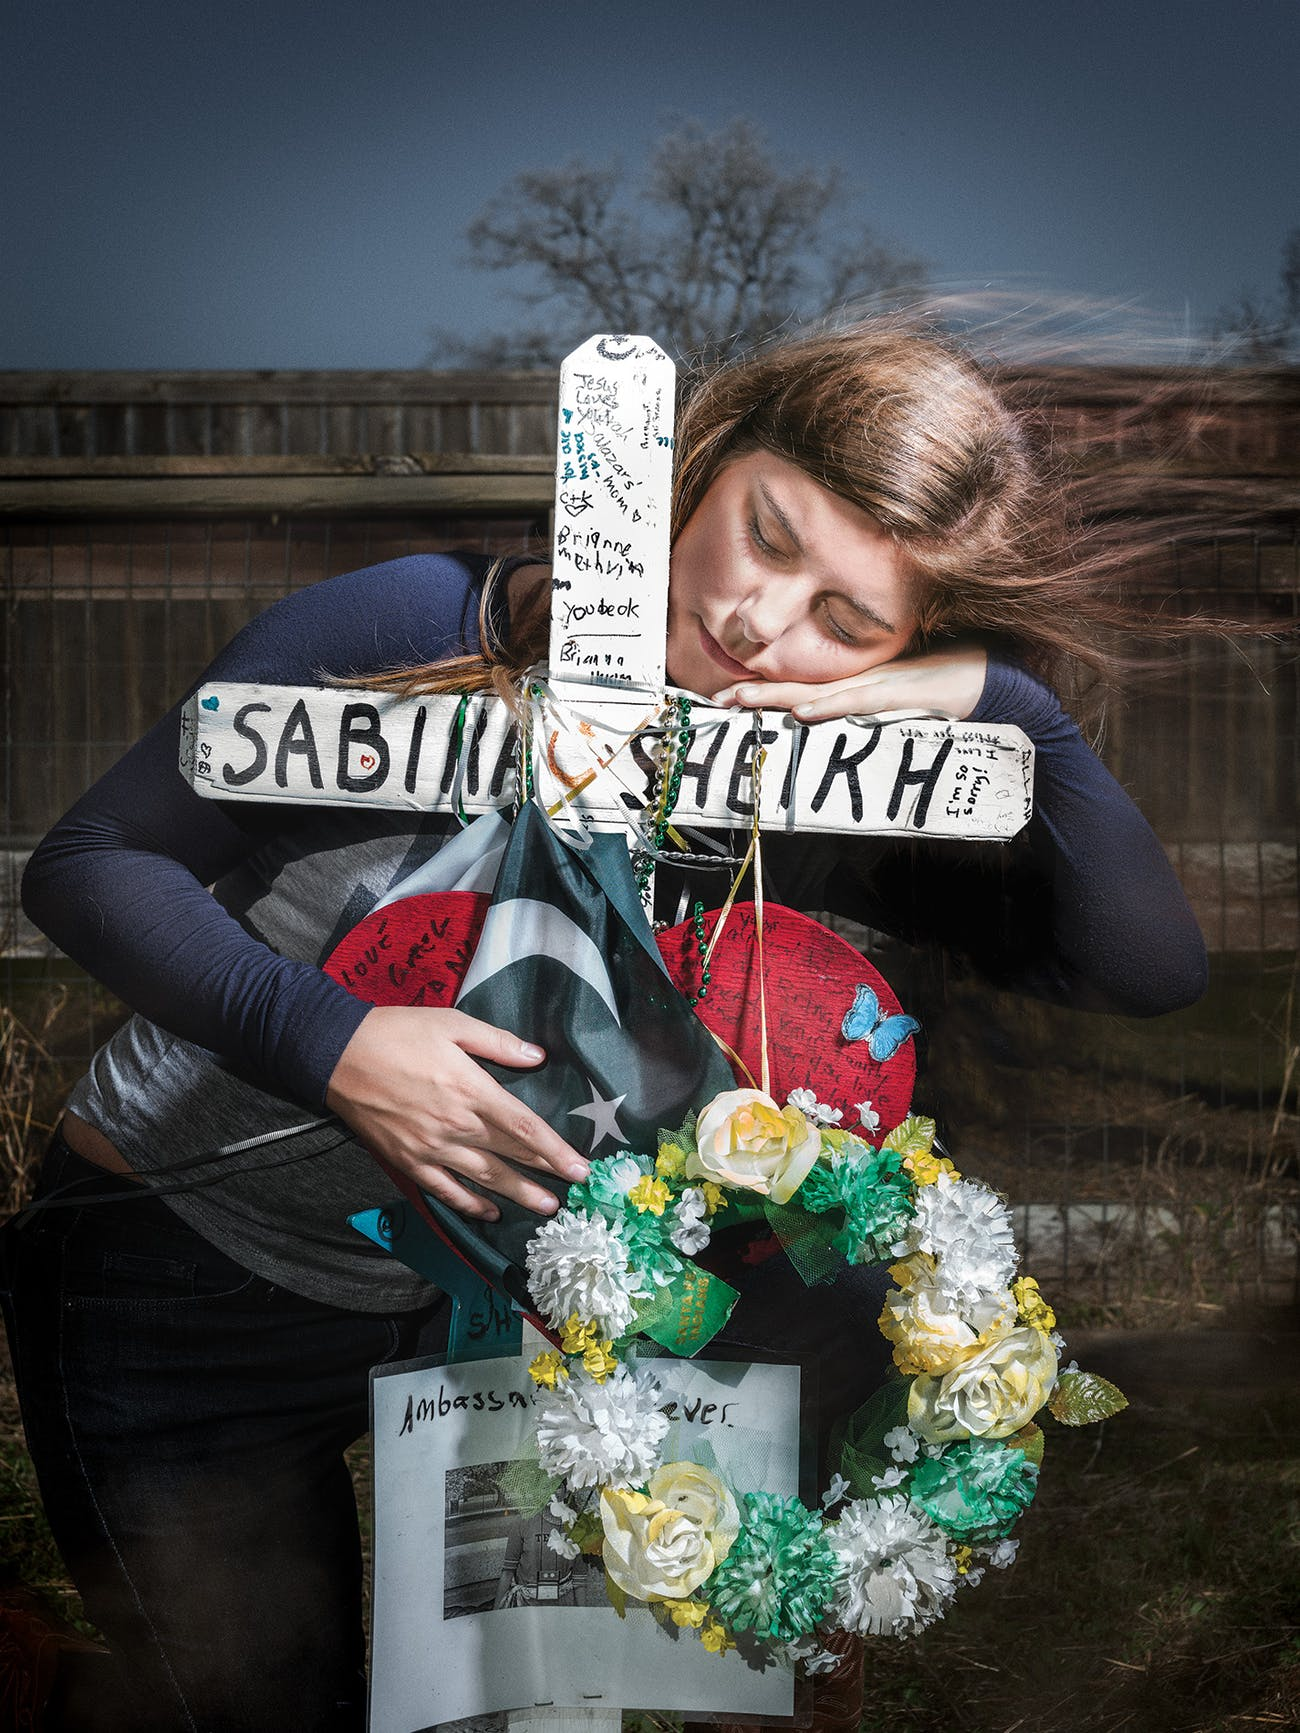 Tragedy In Santa Fe Remembering Sabika Sheikh The Pakistani Student Killed In School Shooting